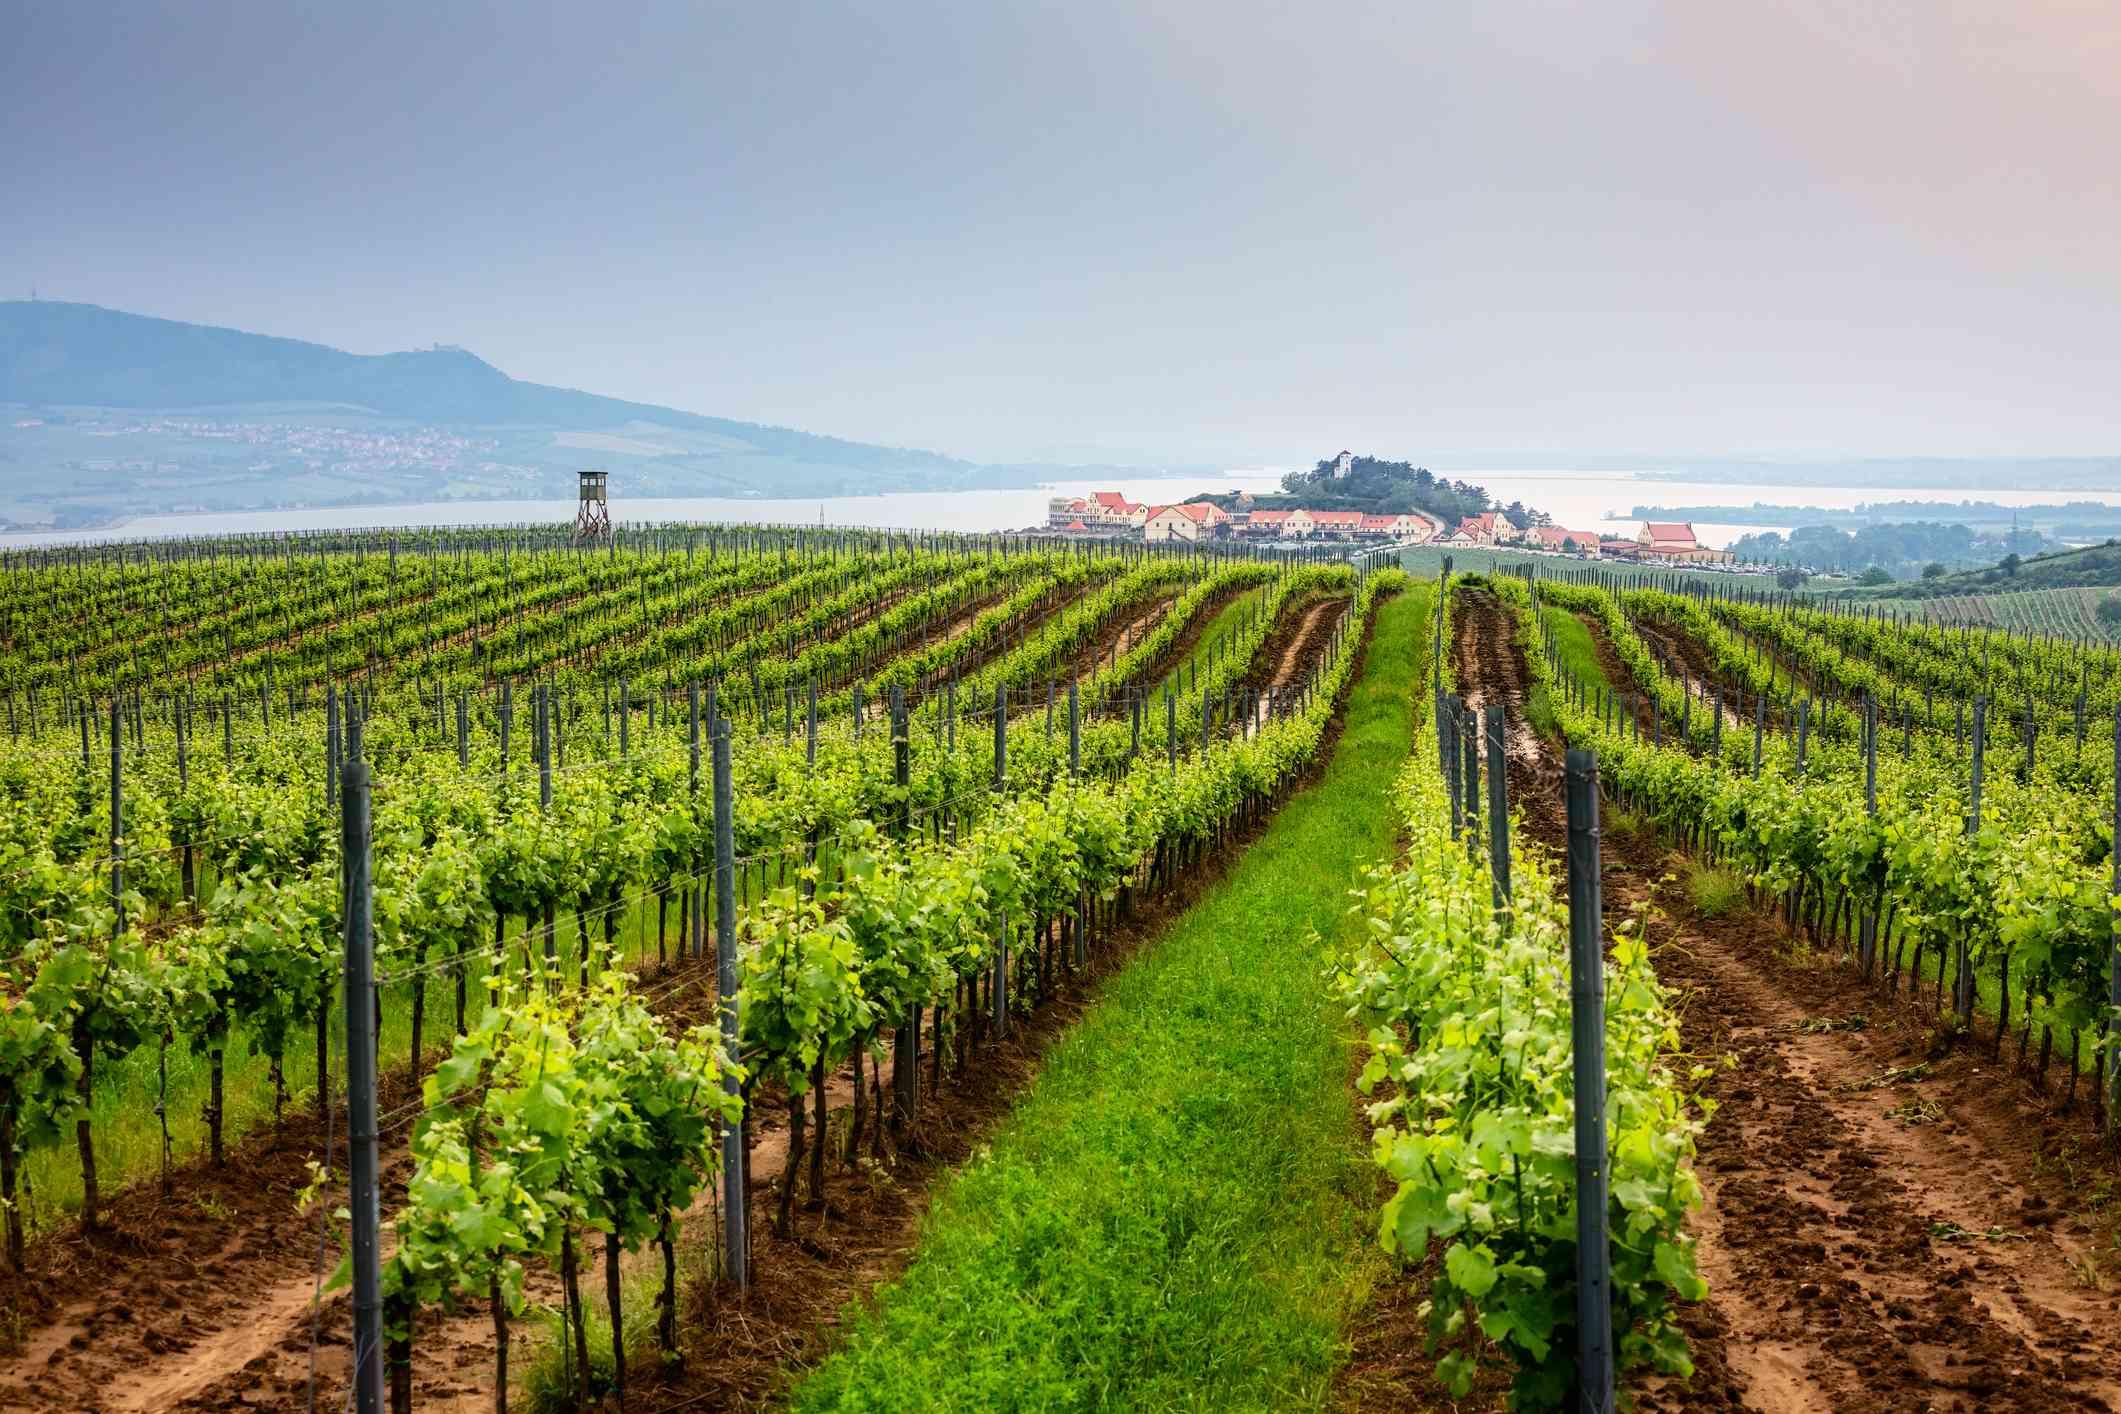 Vineyard in Moravia, Czech republic